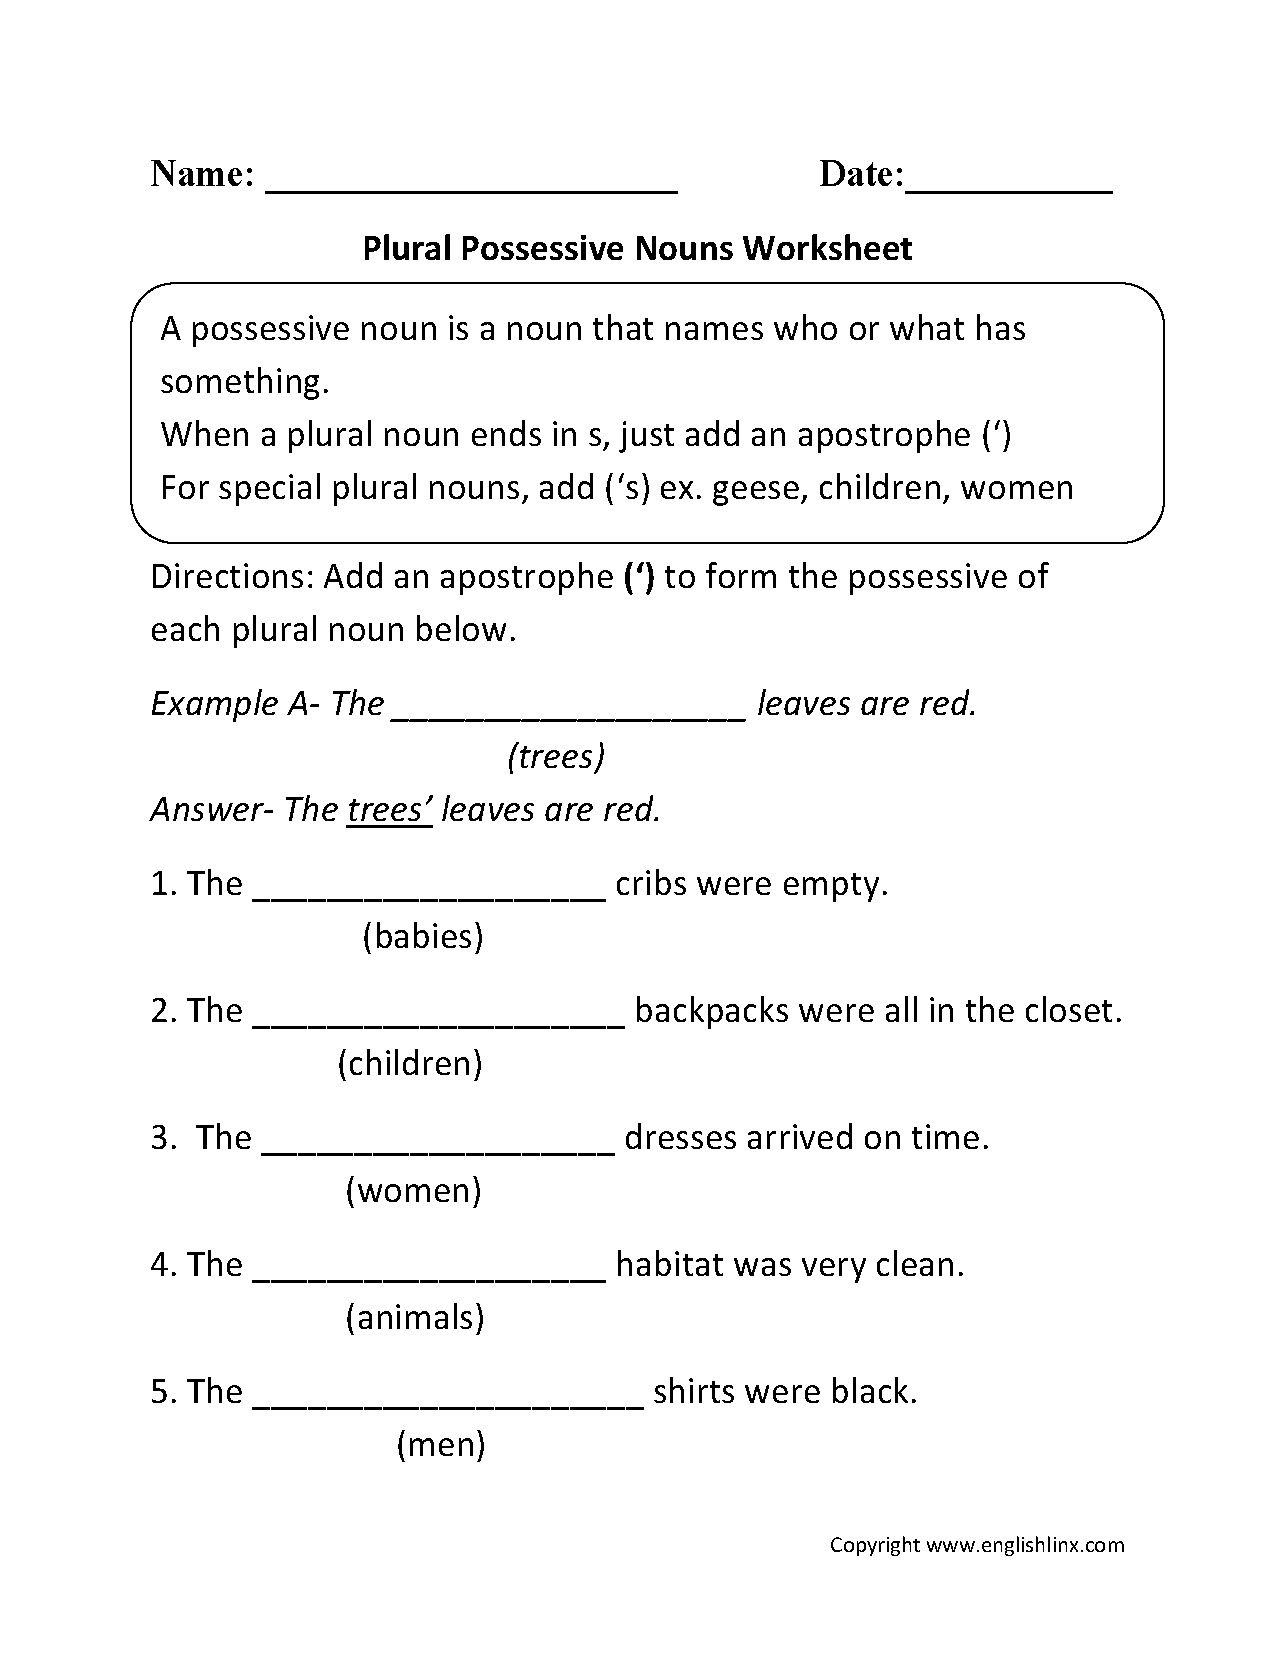 Pronoun Agreement Worksheet